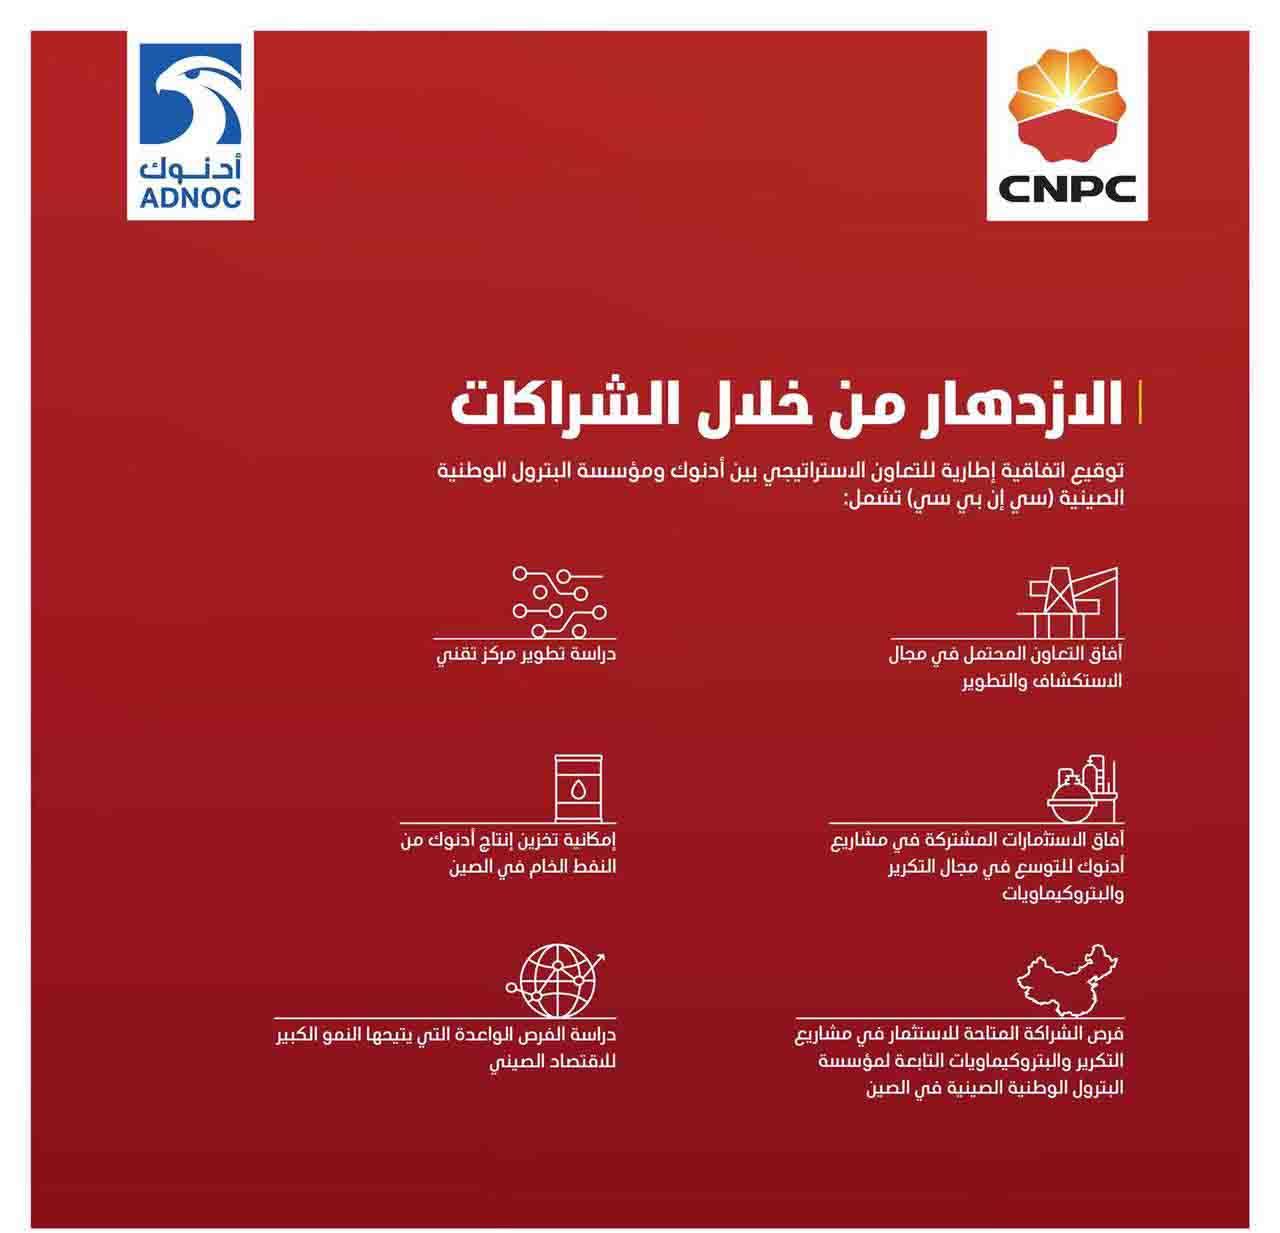 Emirates News Agency - ADNOC, CNPC to explore upstream, downstream